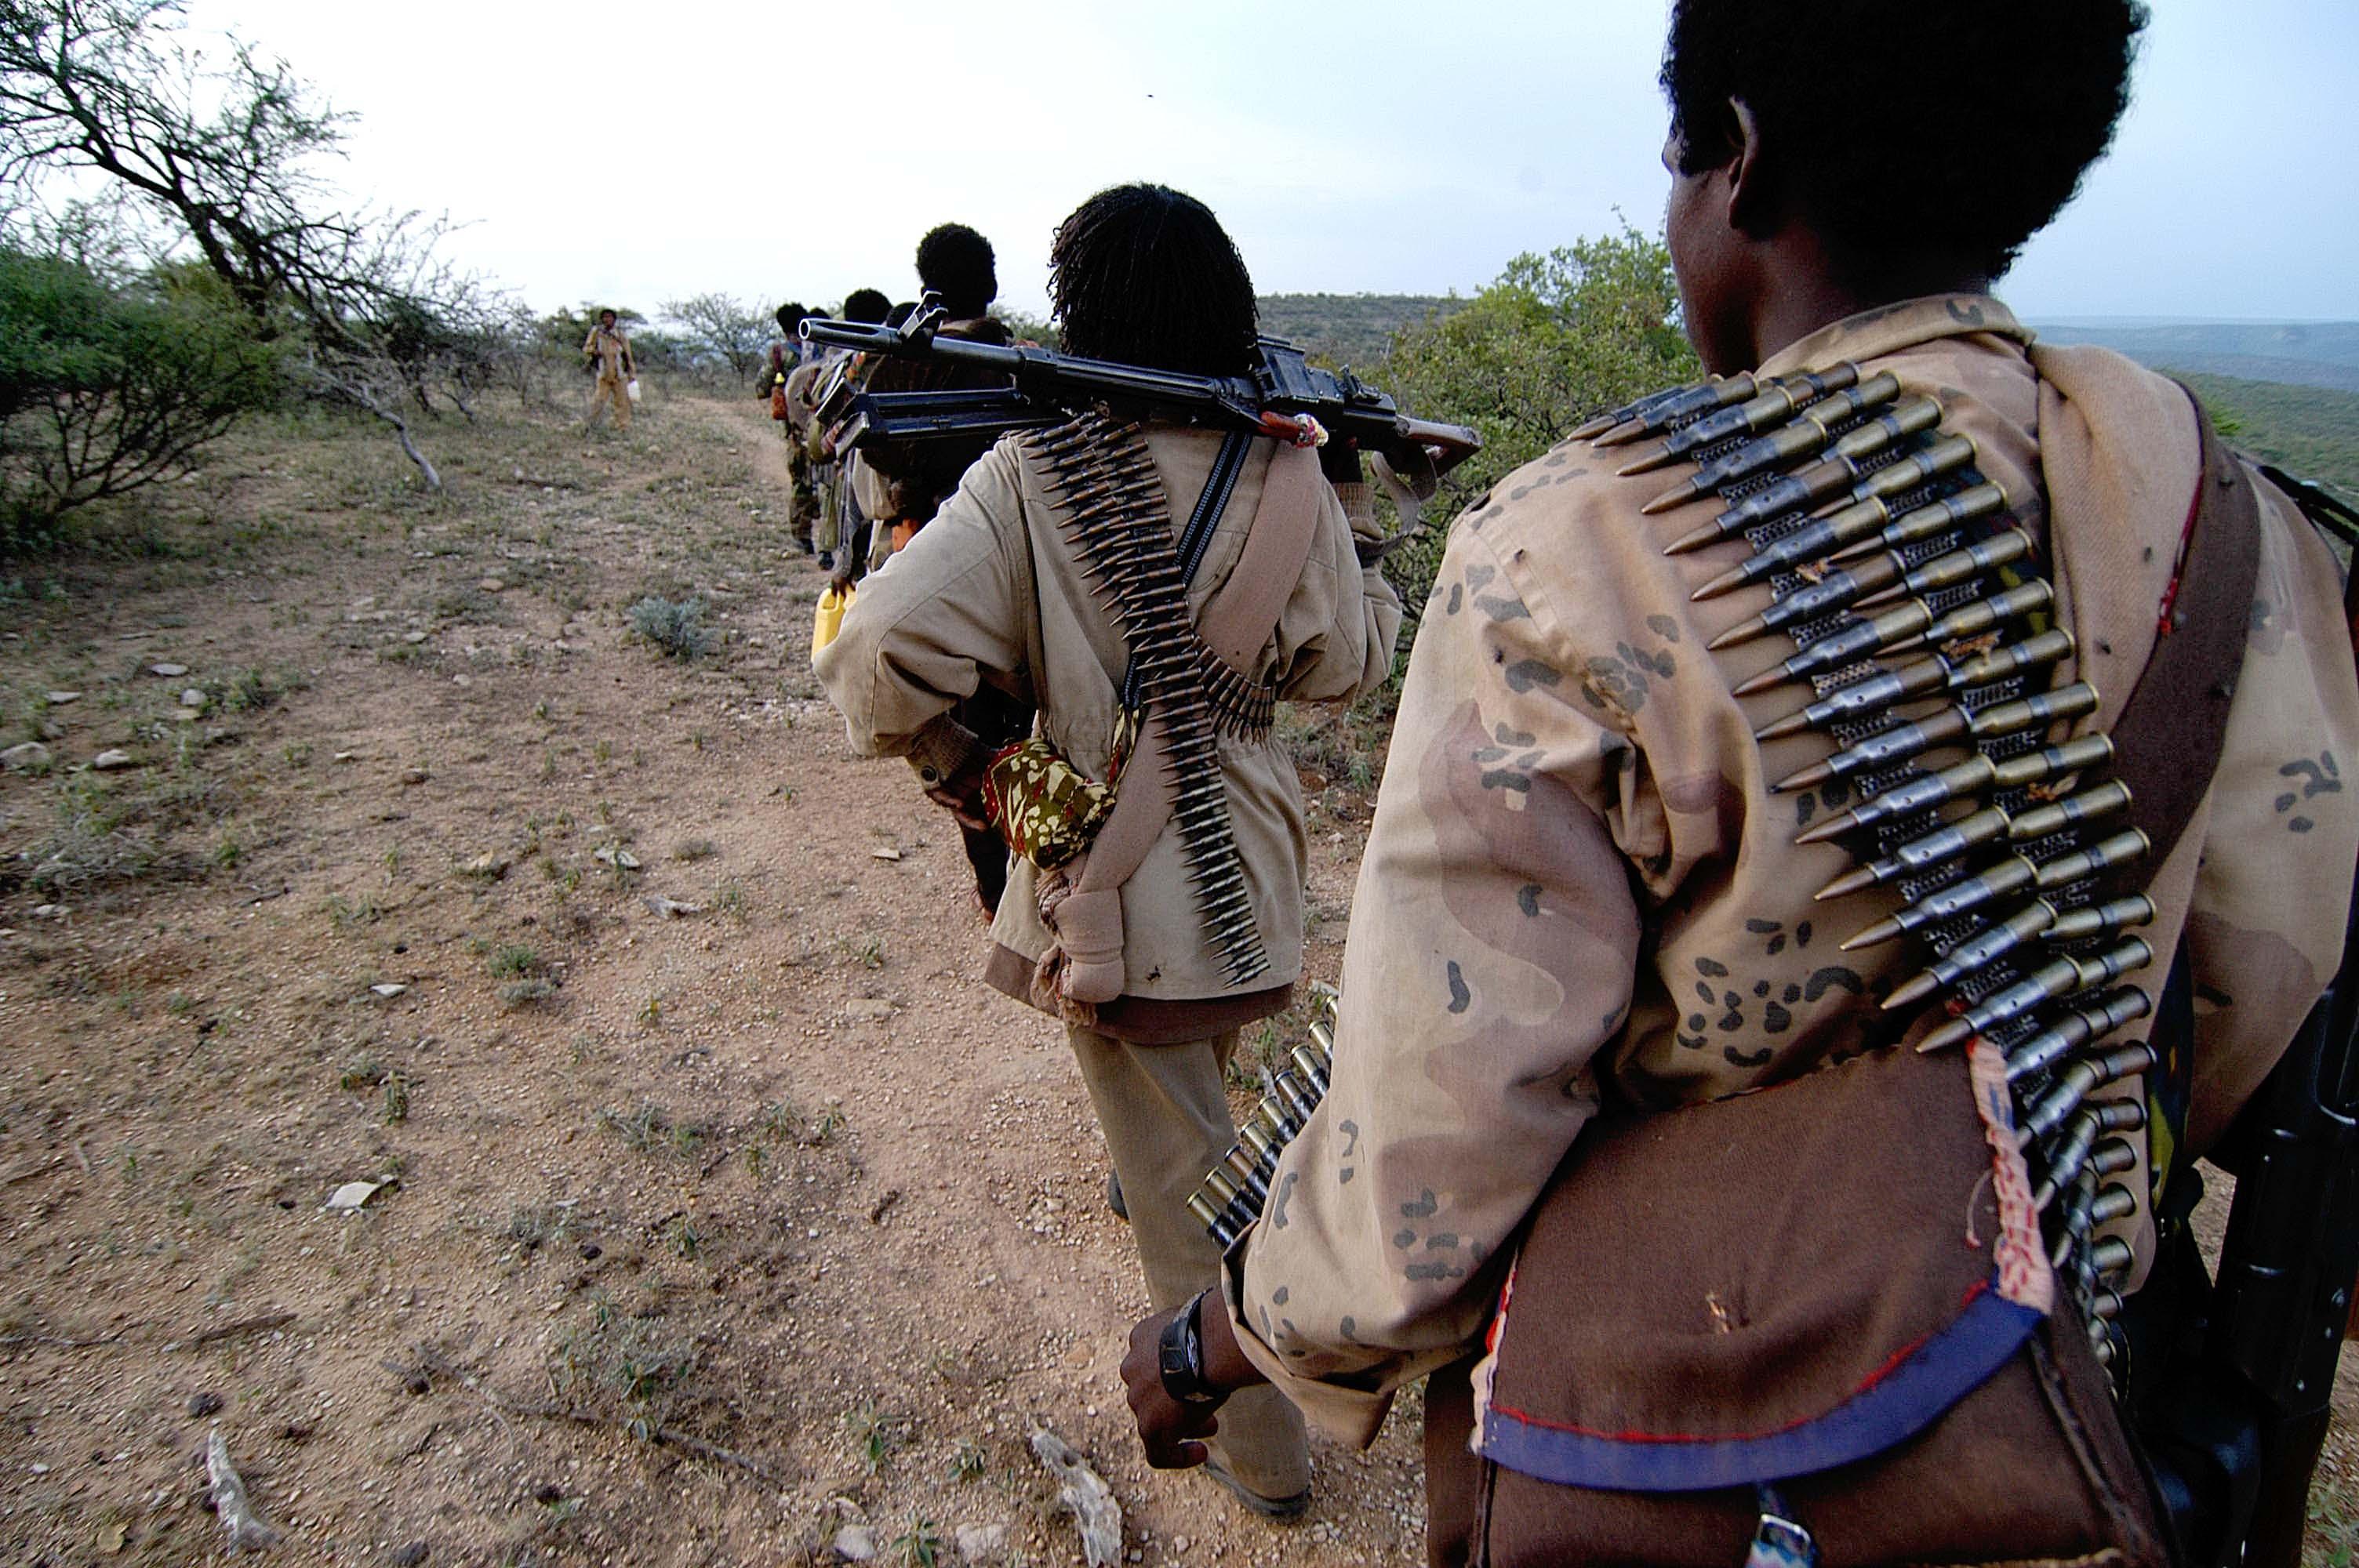 Rebel fighters in Ethiopia, 2006. Photo by Jonathan Alpeyrie, via Wikimedia.